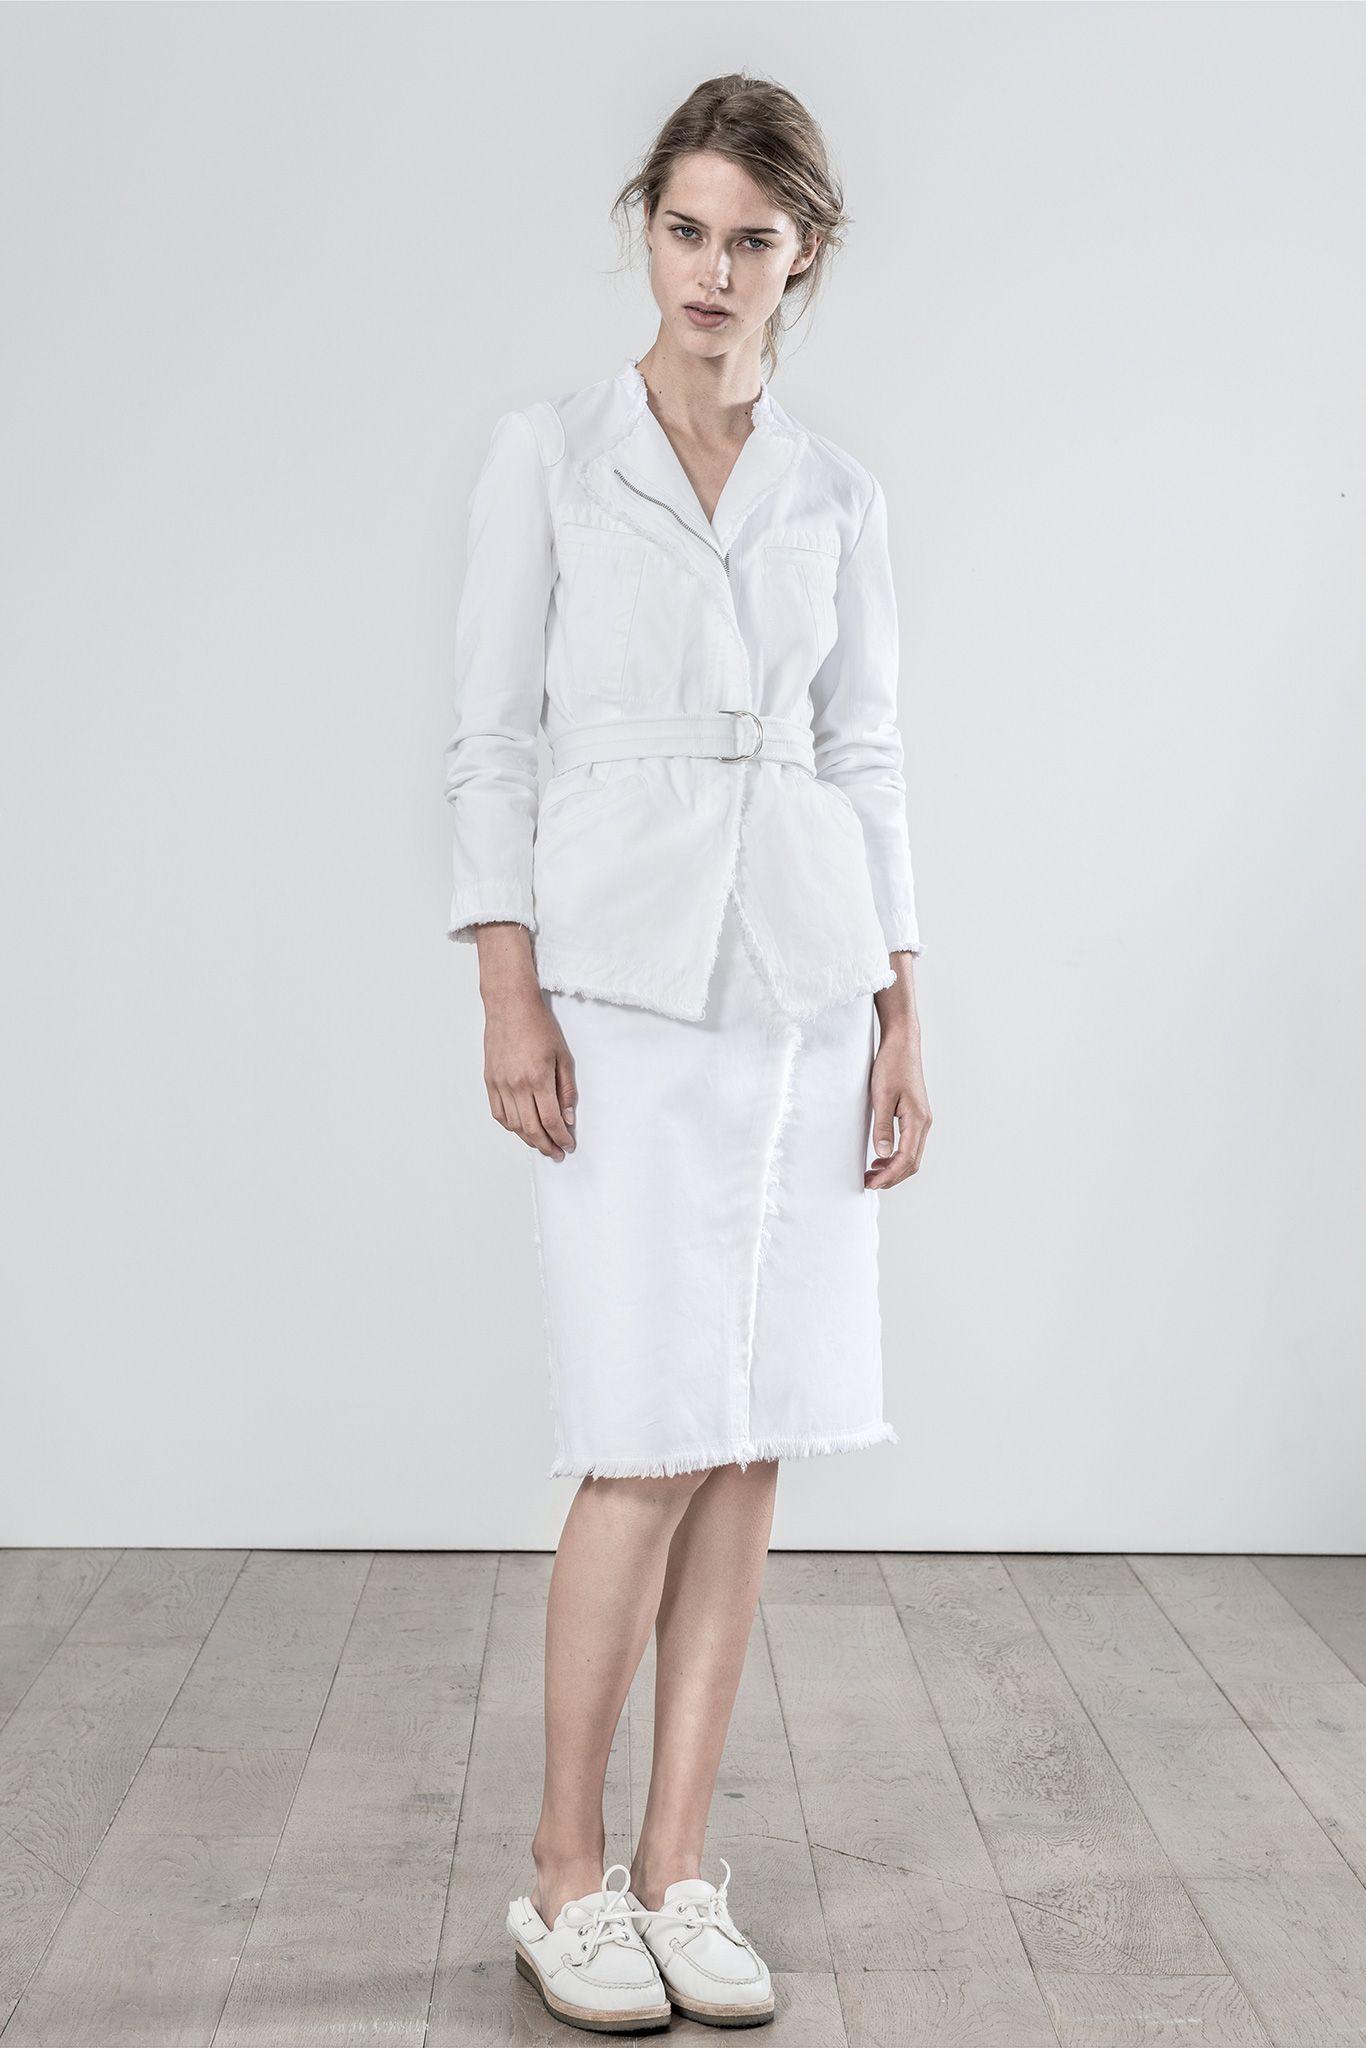 Spring 2015 Ready-to-Wear - Vanessa Bruno